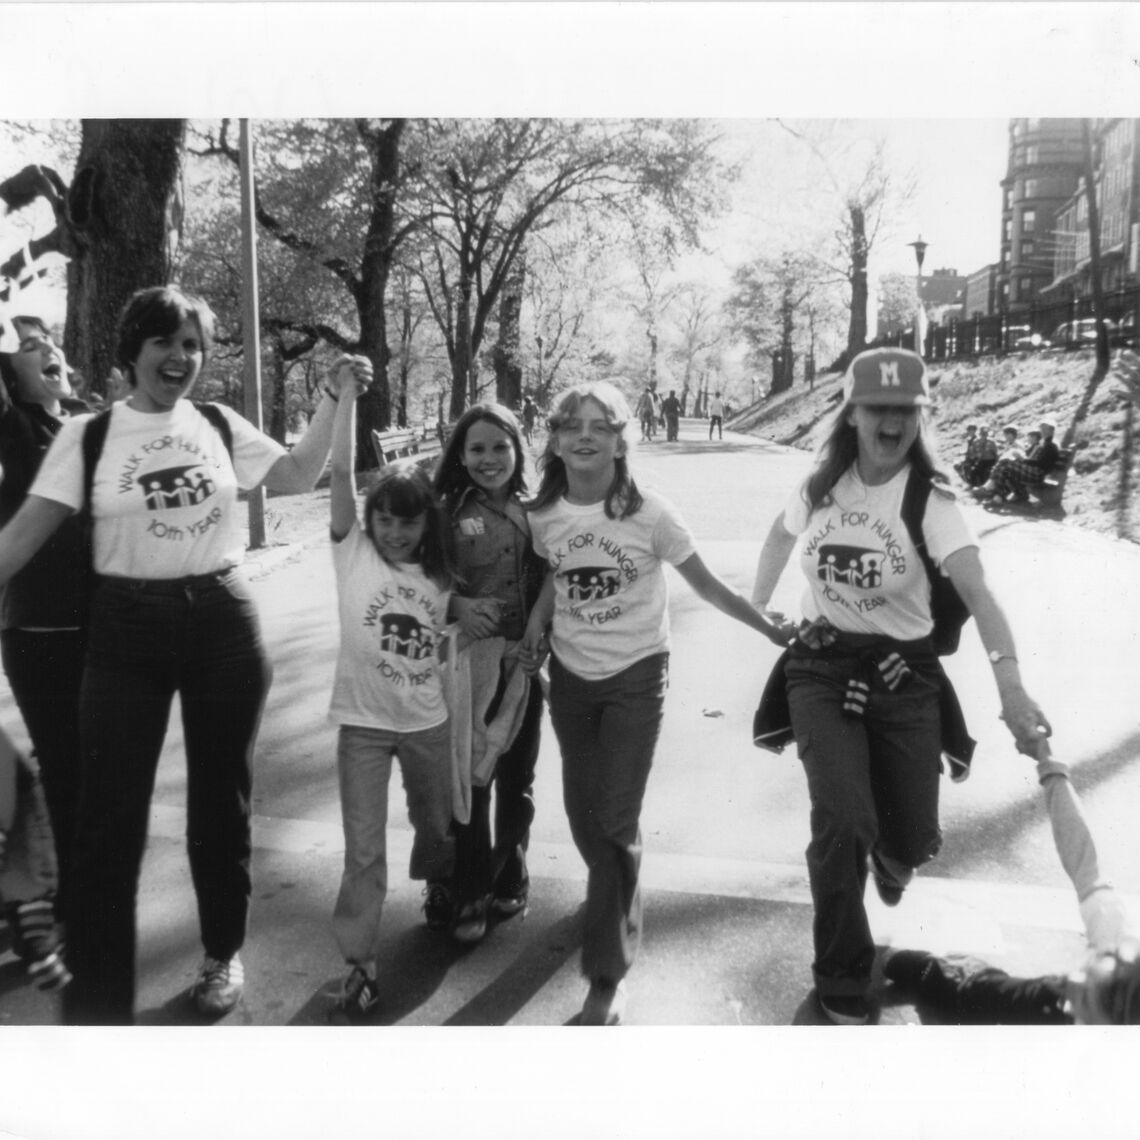 The 1979 Walk for Hunger